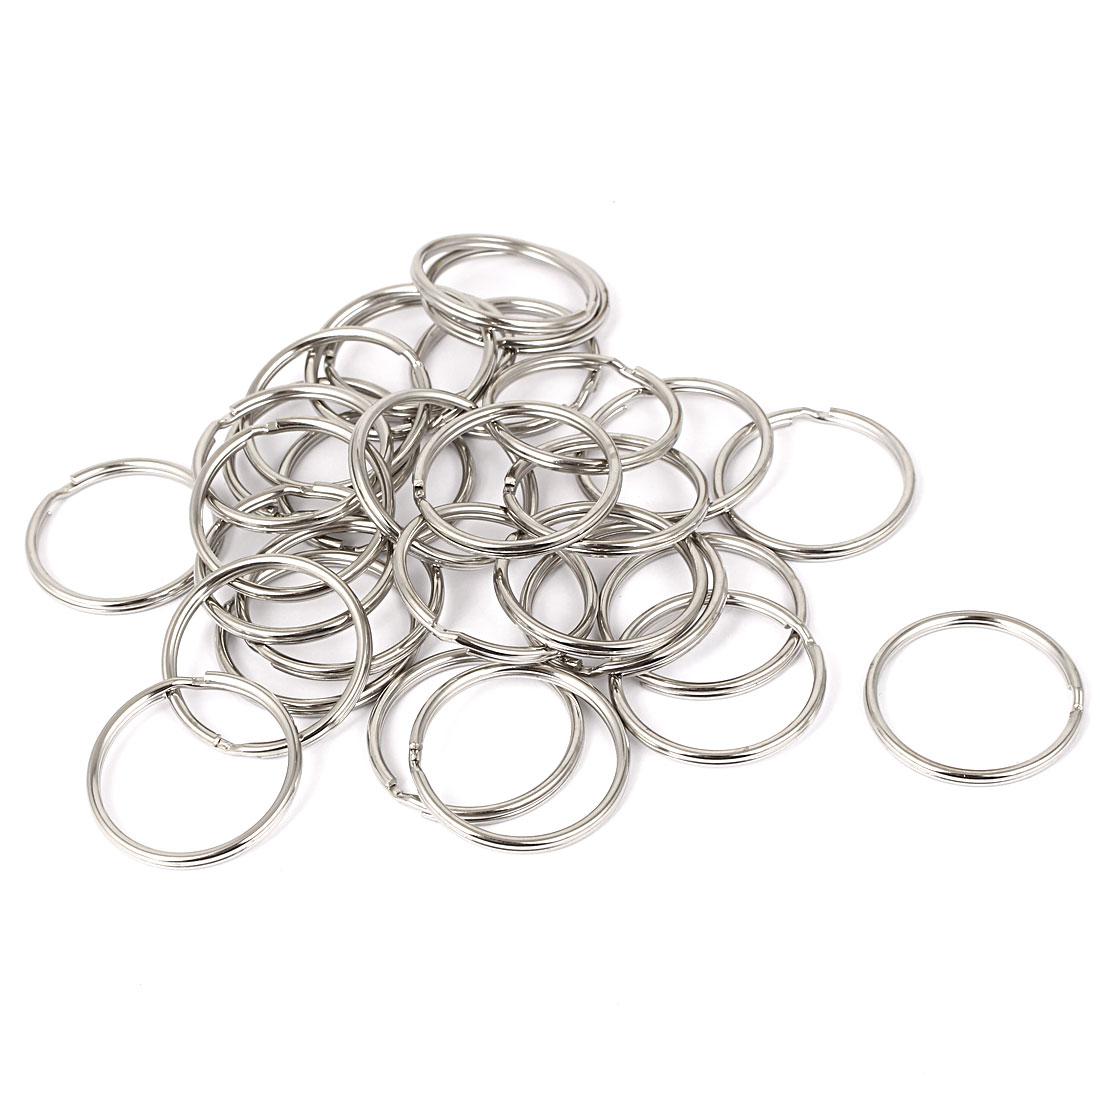 30pcs 35mm Dia Silver Tone Metal Split Ring Keychain Keyring Key Holder